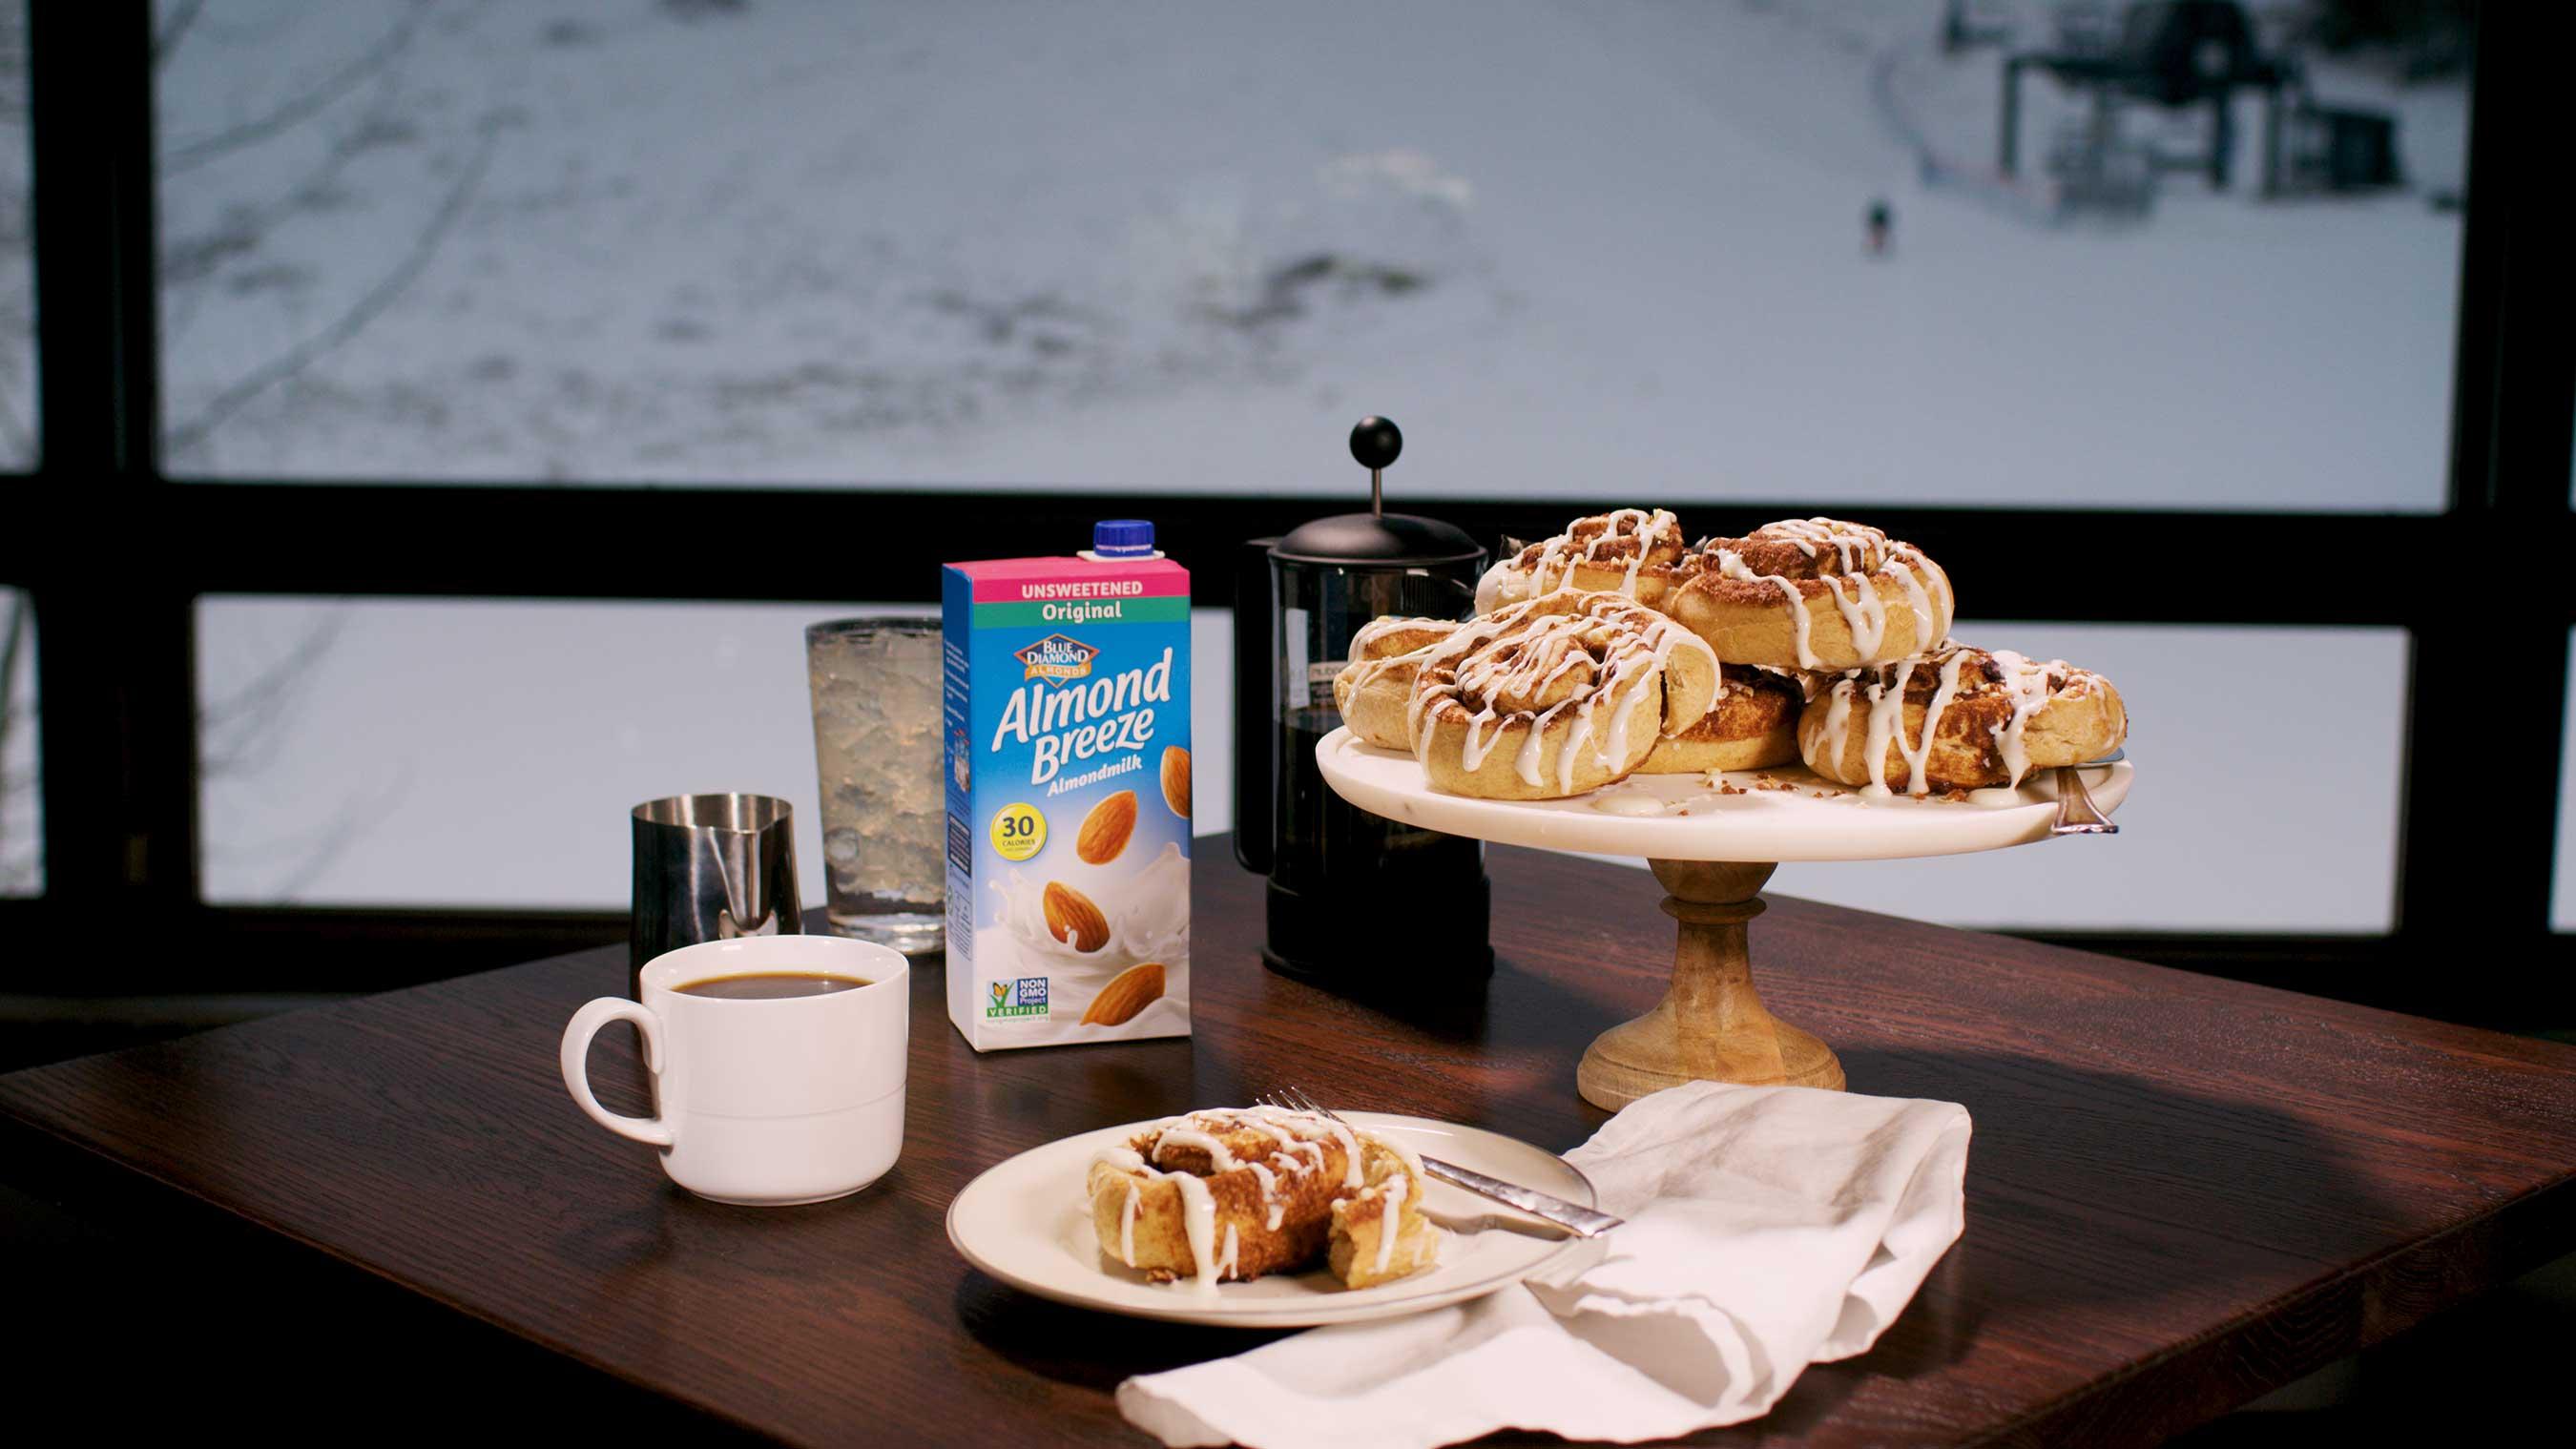 Blue Diamond Extends Partnership to Serve as Official Almondmilk and Snack Nut for the U.S. Ski & Snowboard Team